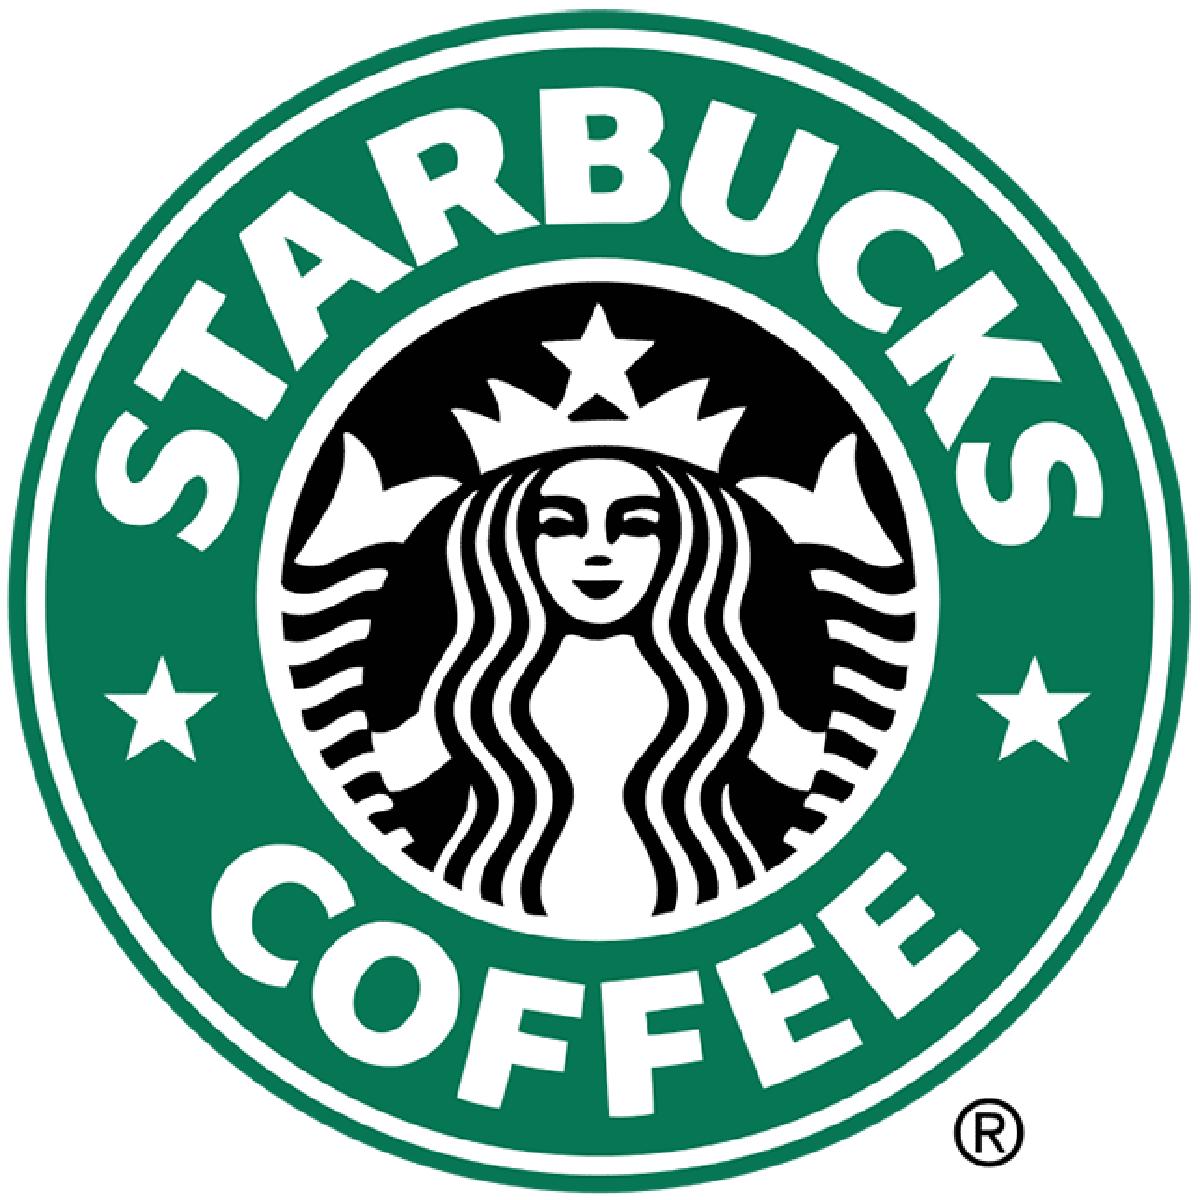 Starbucks Coffee Corp